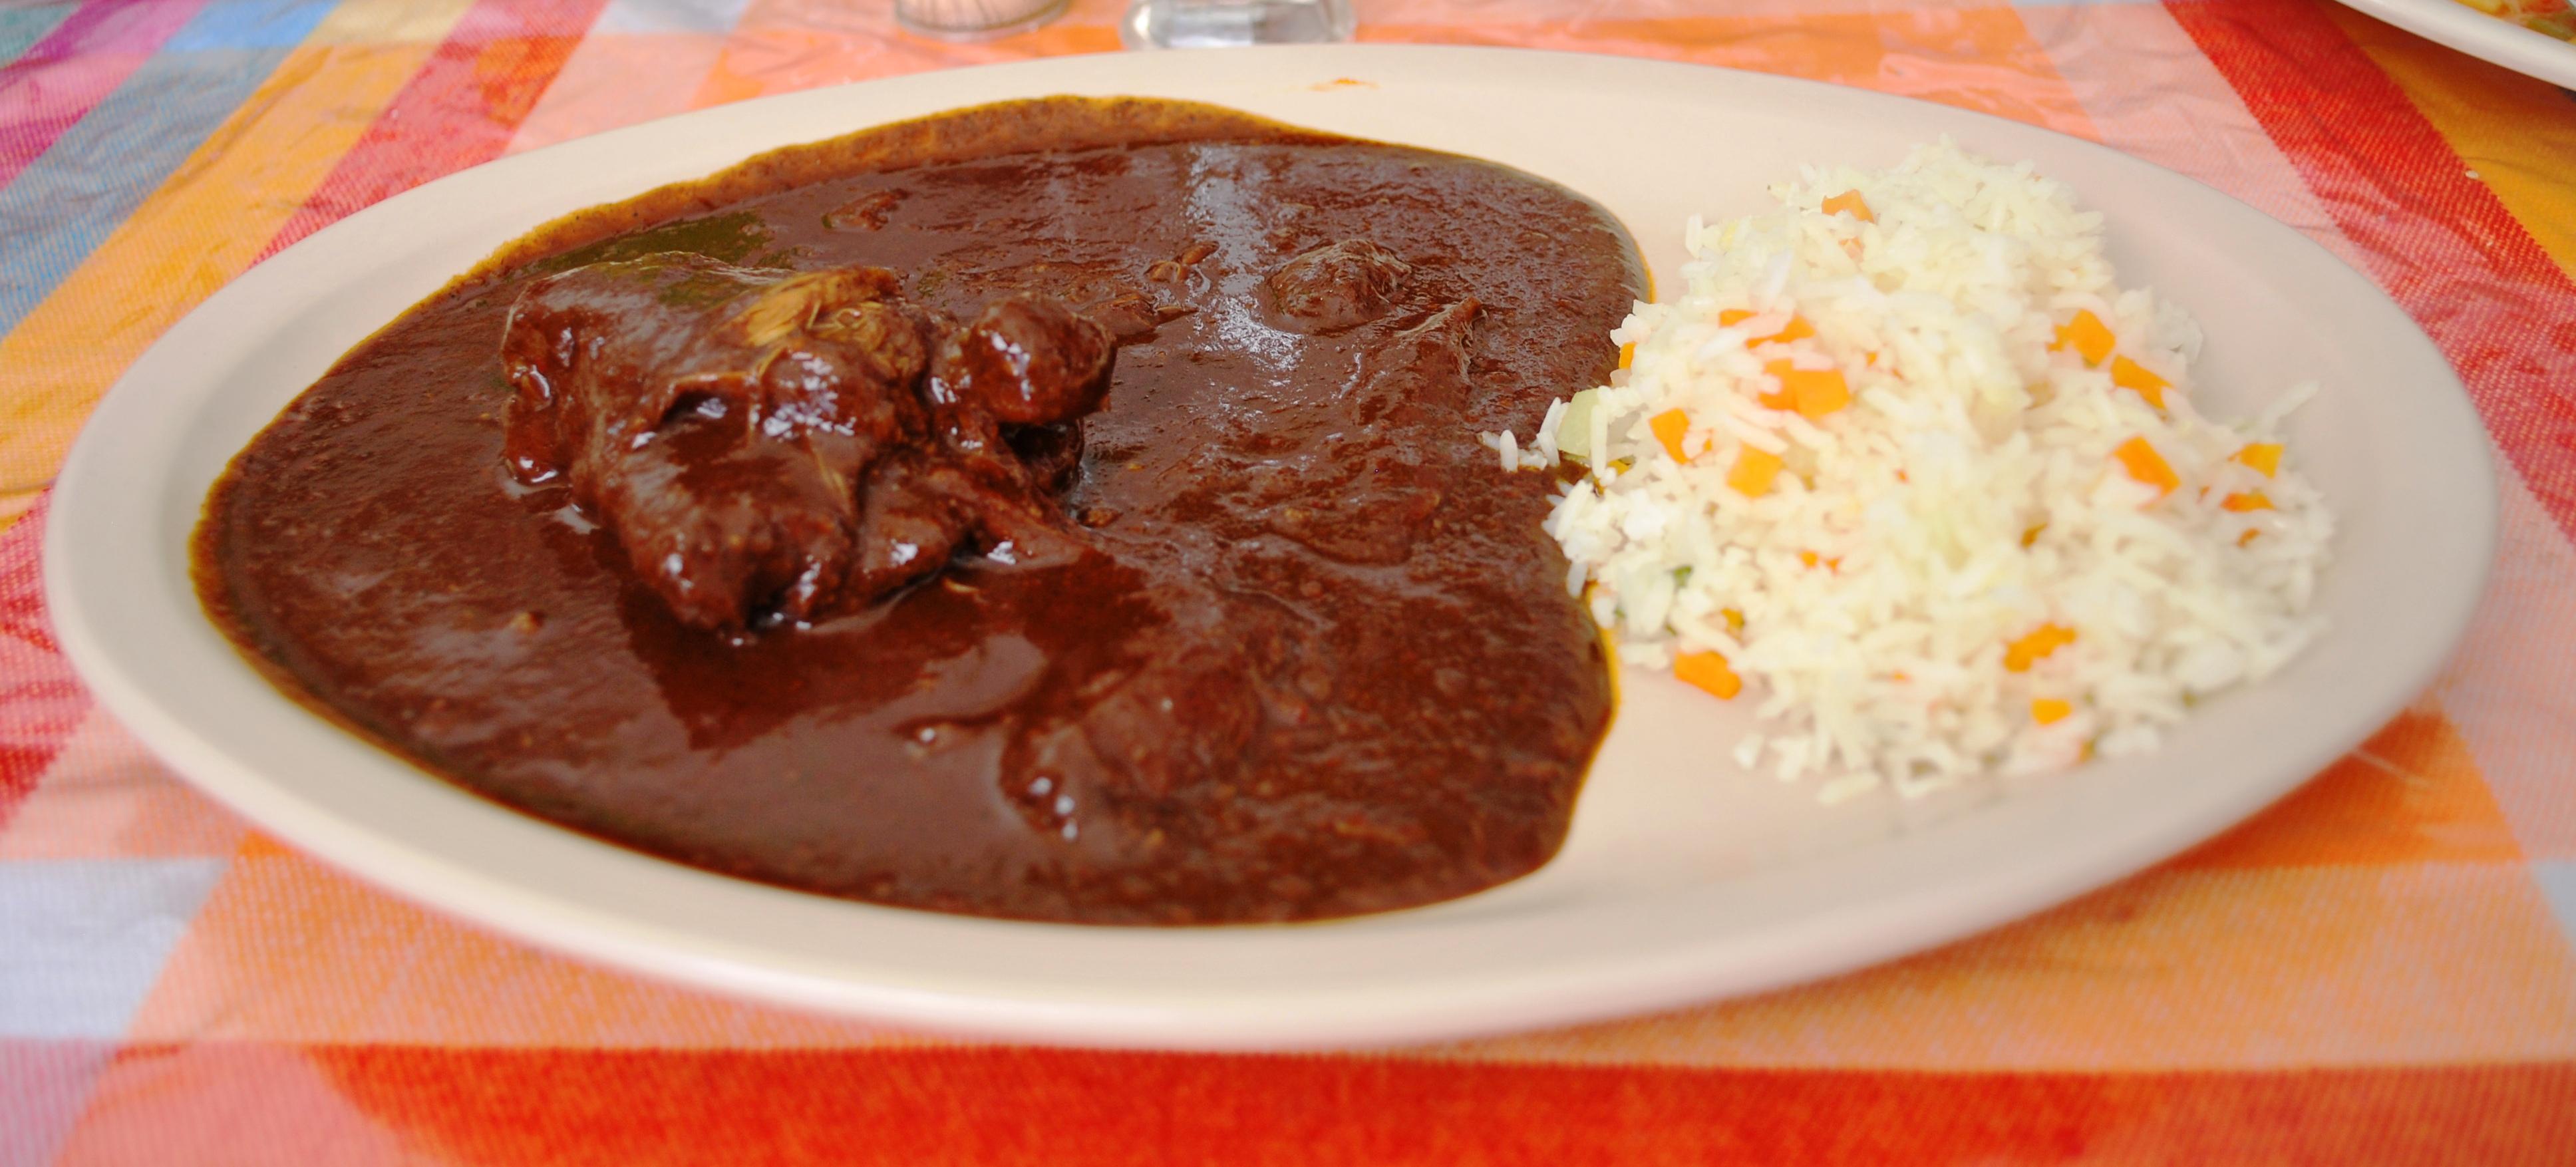 Mole (sauce)